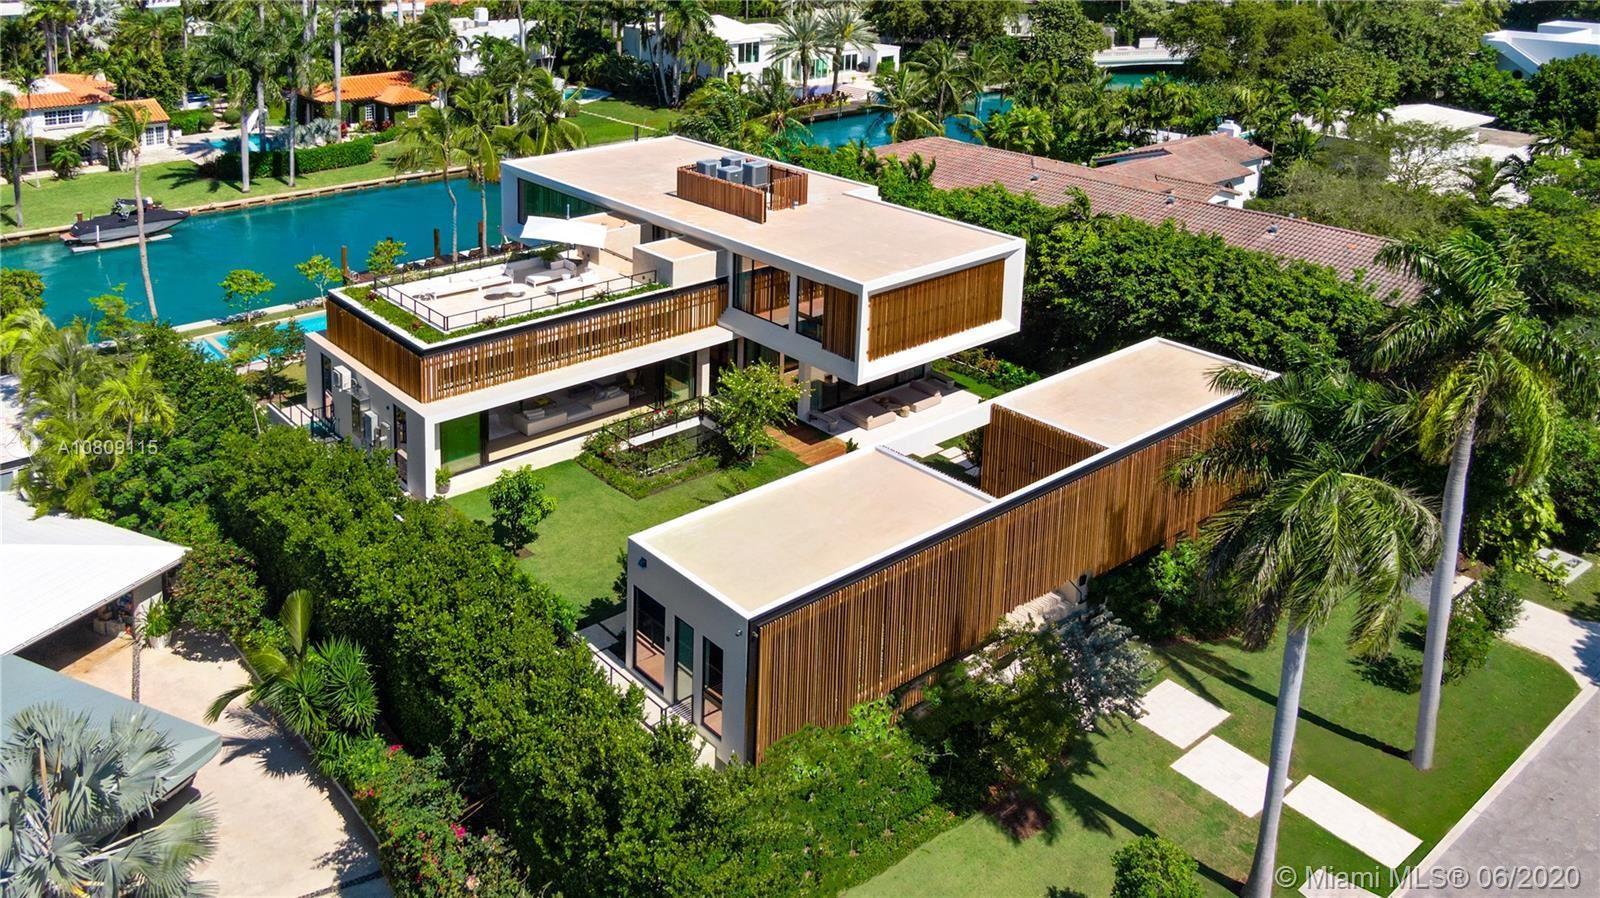 Photo 10 of Listing MLS a10809115 in 1635 W 22nd St Miami Beach FL 33140